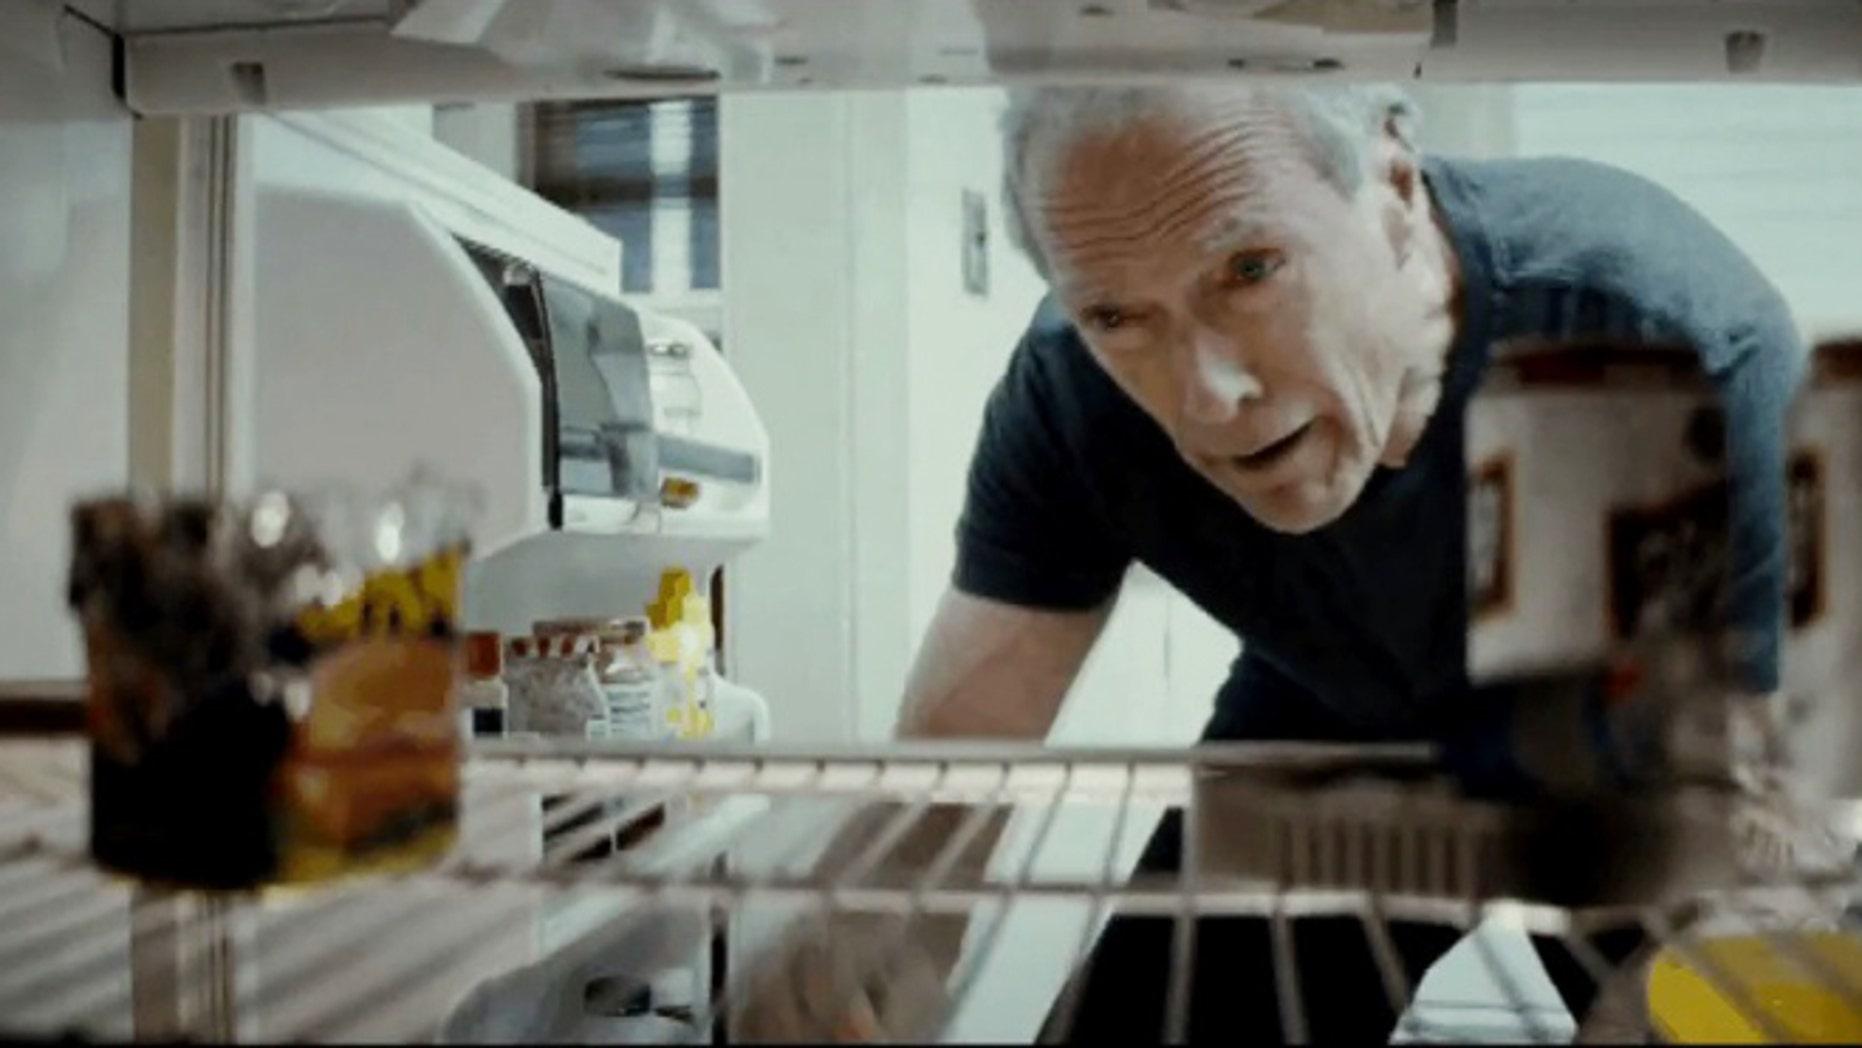 Who knew fridges could evoke such feeling?